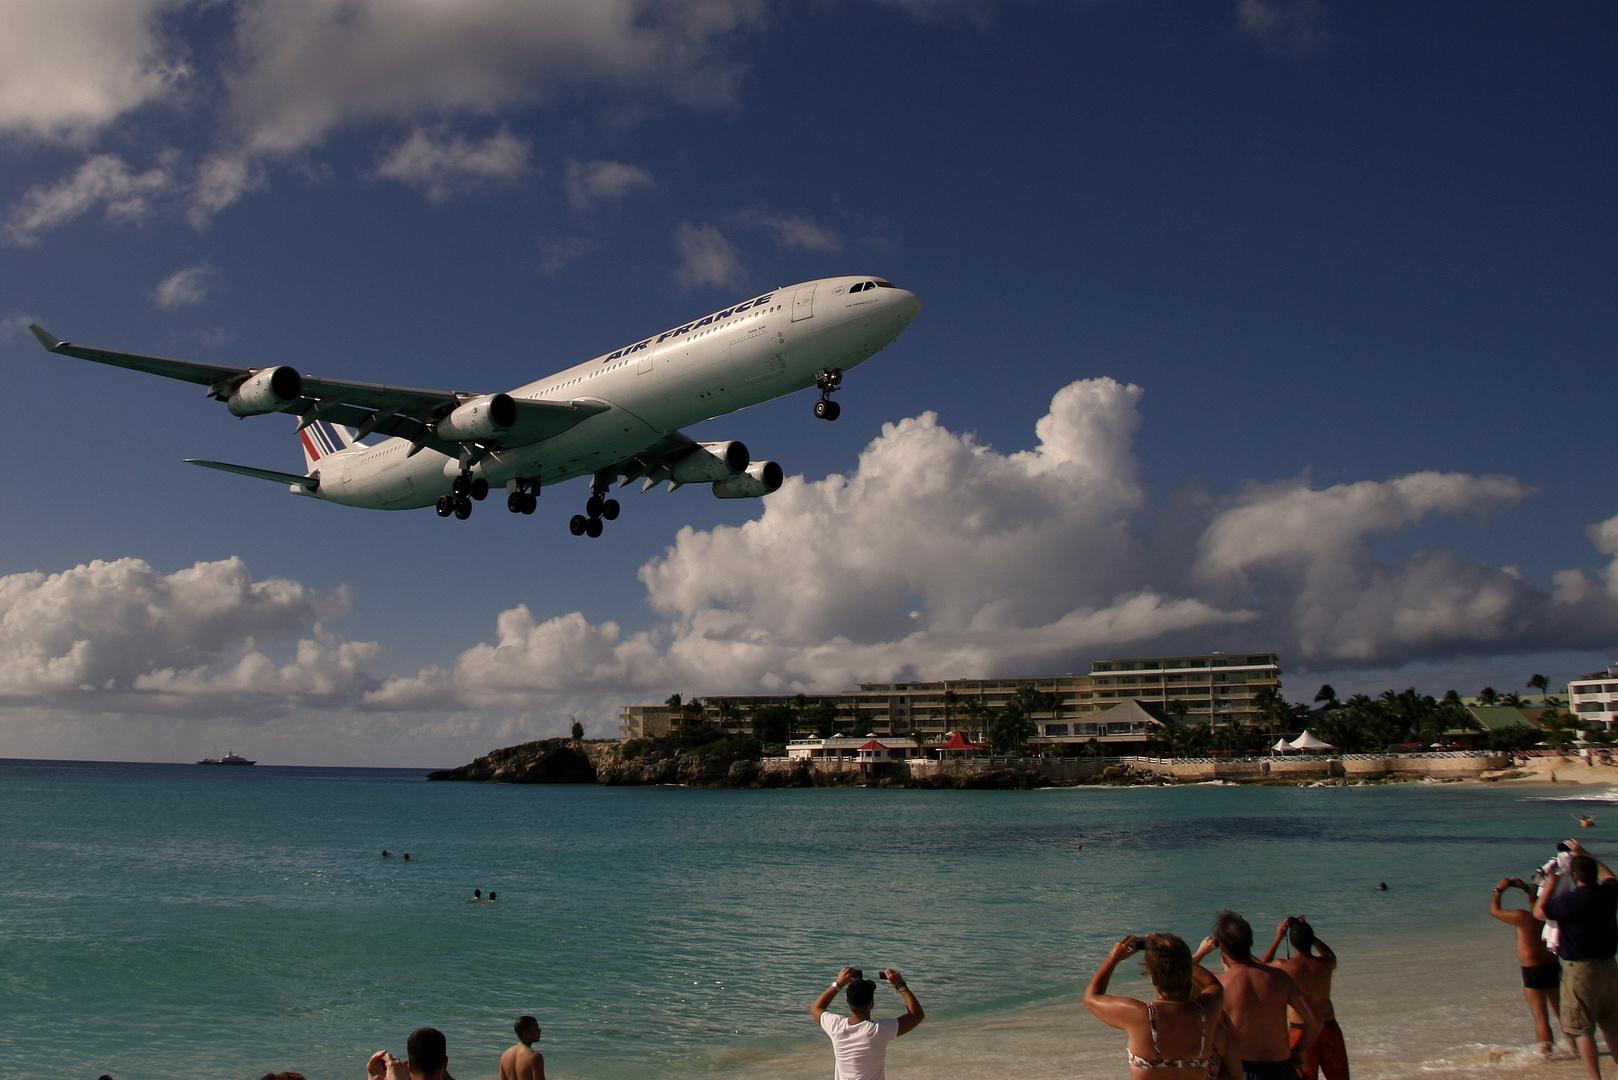 F-GLZU im Anflug au f St. Maarten